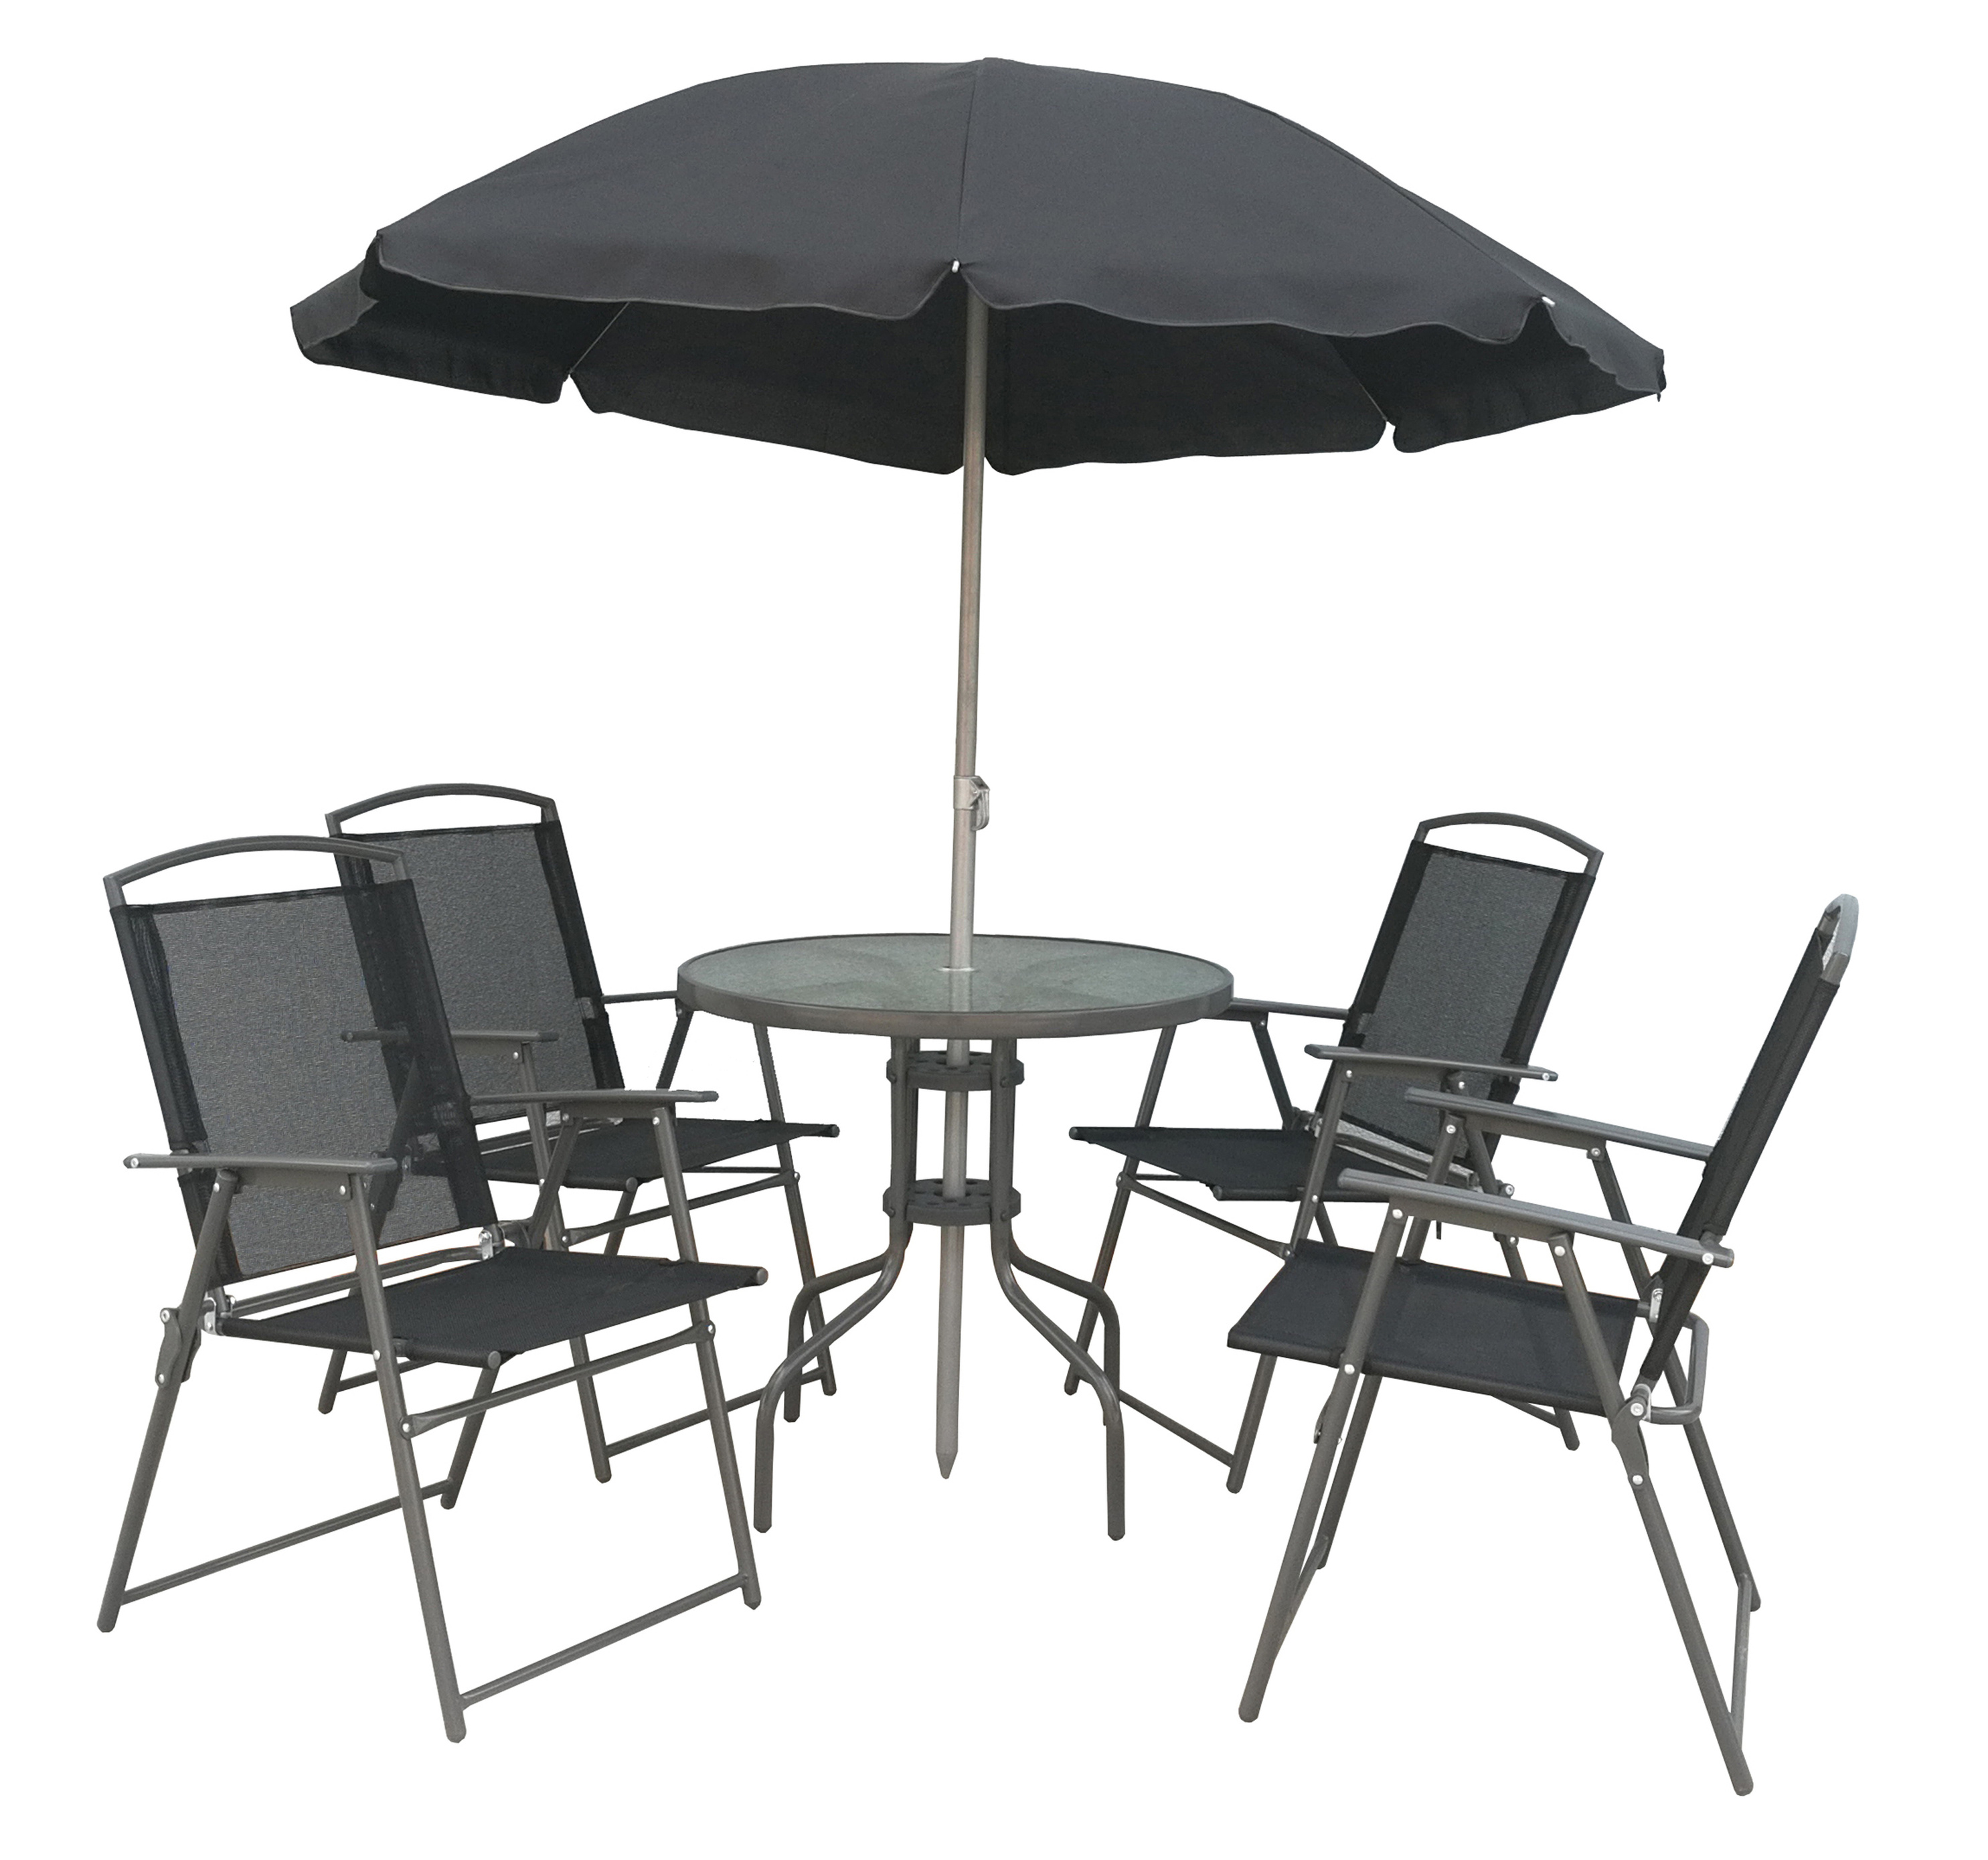 Vcm 6 Teiliges Gartenmobel Set Tisch Stuhle Schirm Vcm Metallsitzgruppe Farbe Anthrazit Weltbild De